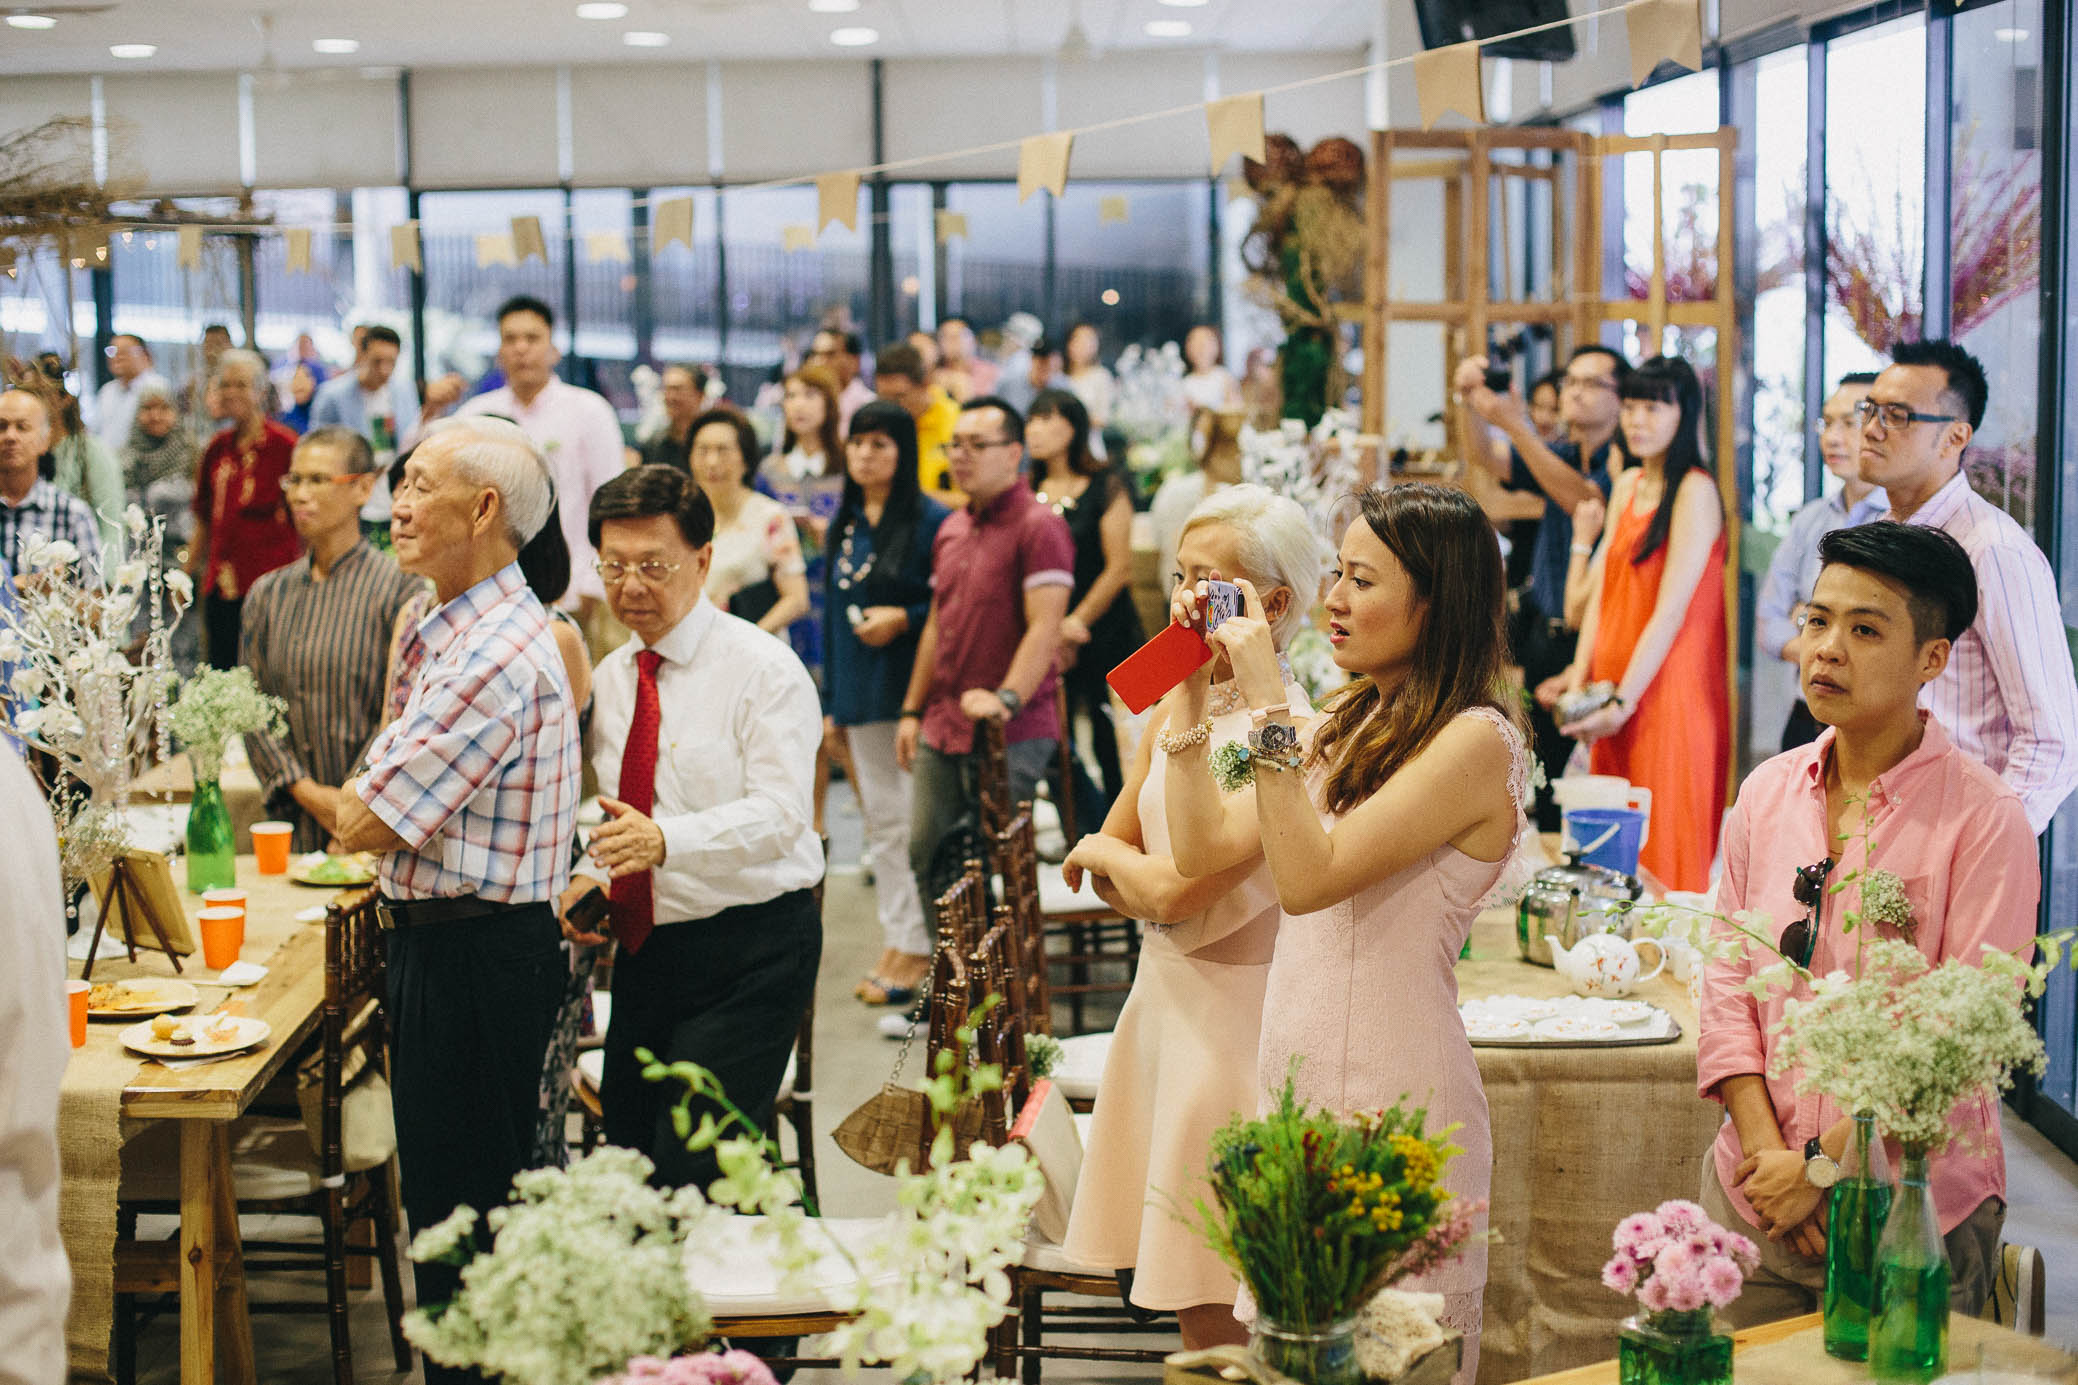 singapore-wedding-photographer-malay-indian-pre-wedding-travel-wmt-2015-alif-ethel-49.jpg